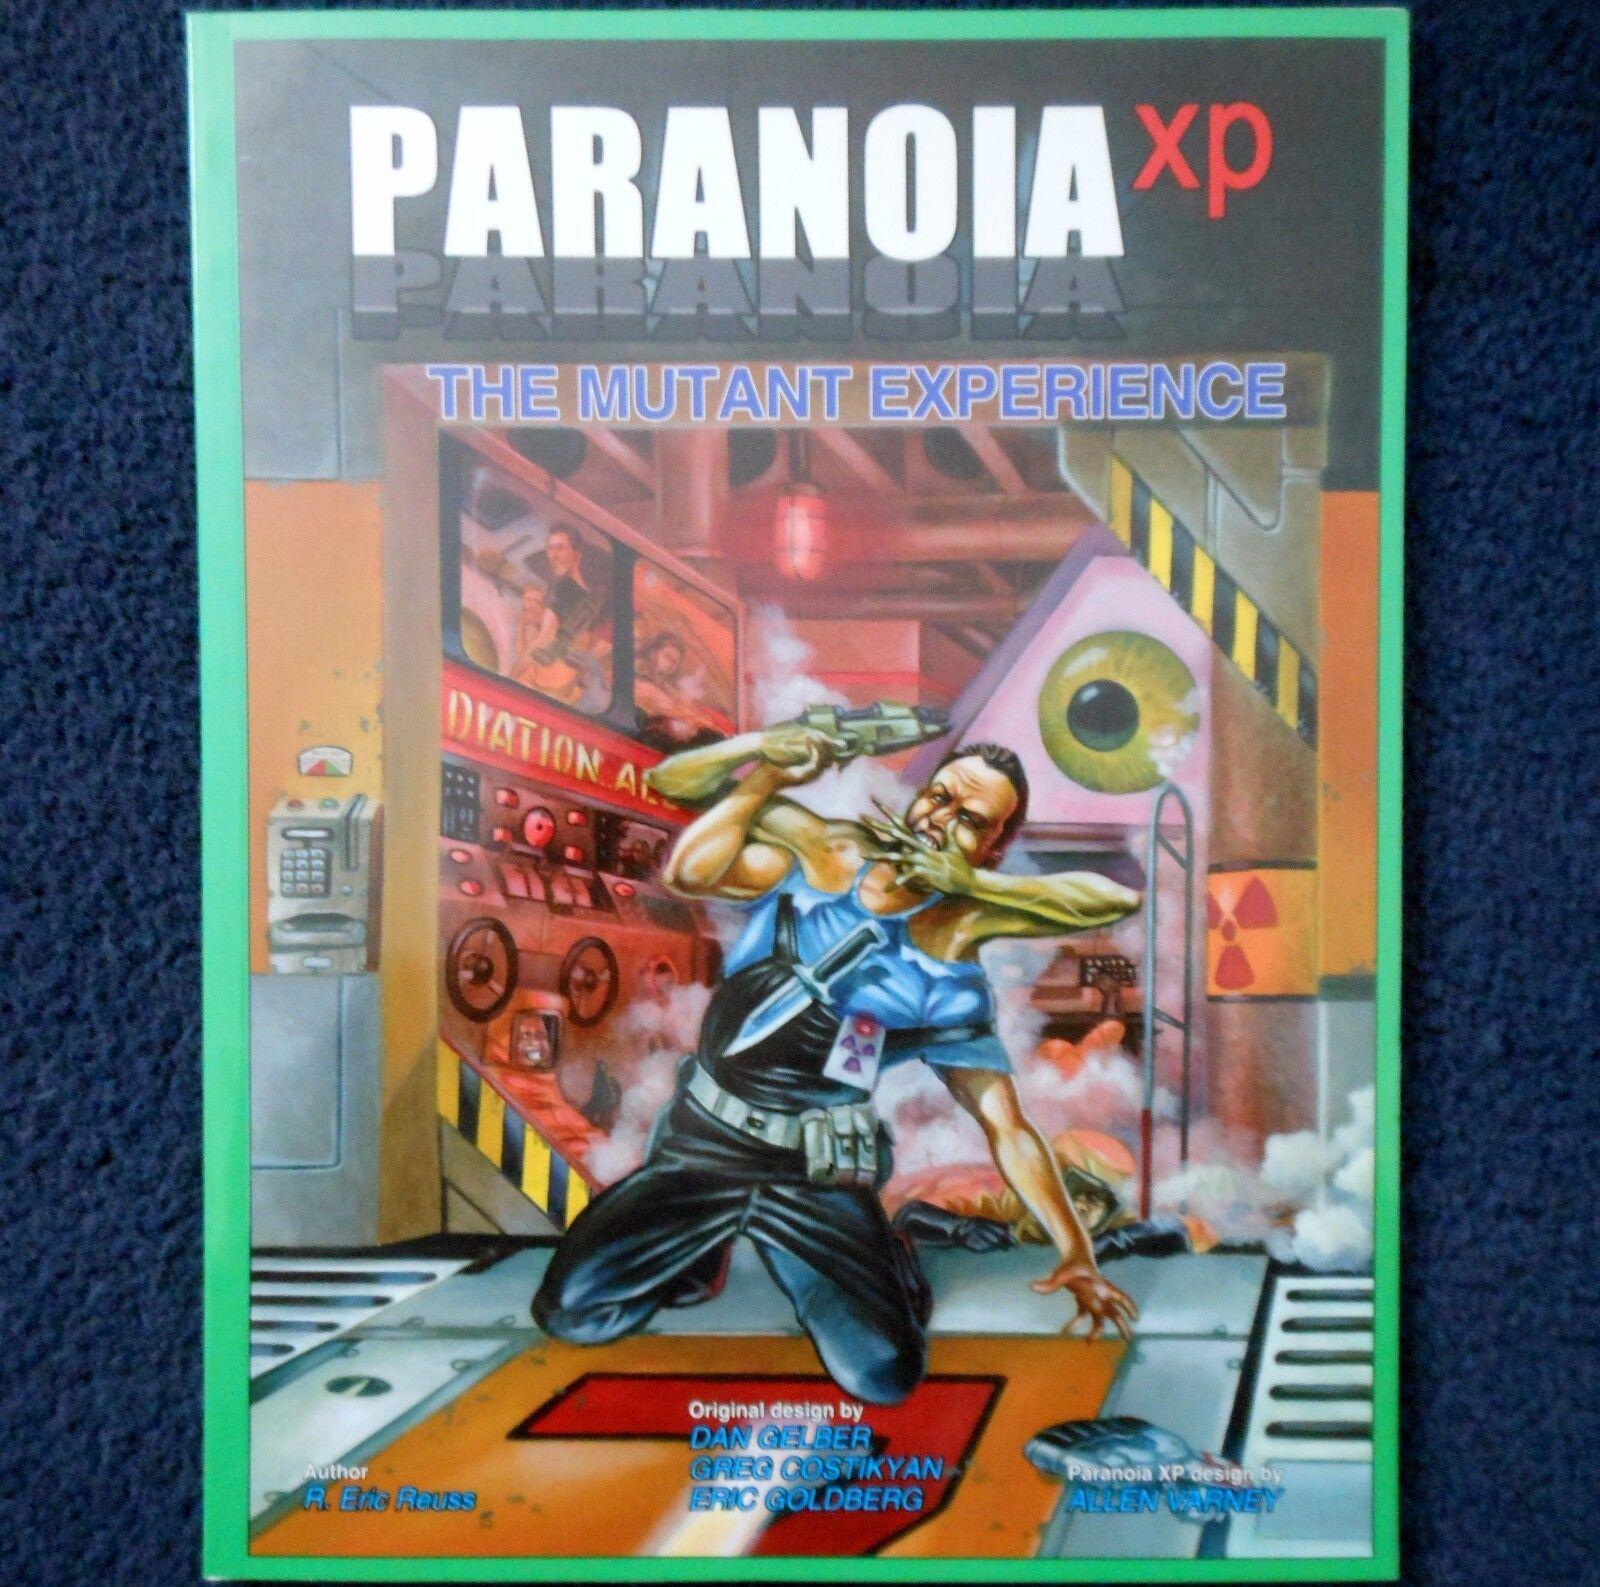 2005 das mutanten - erfahrung paranoia xp abenteuer modul mungo sci - fi - map 6634